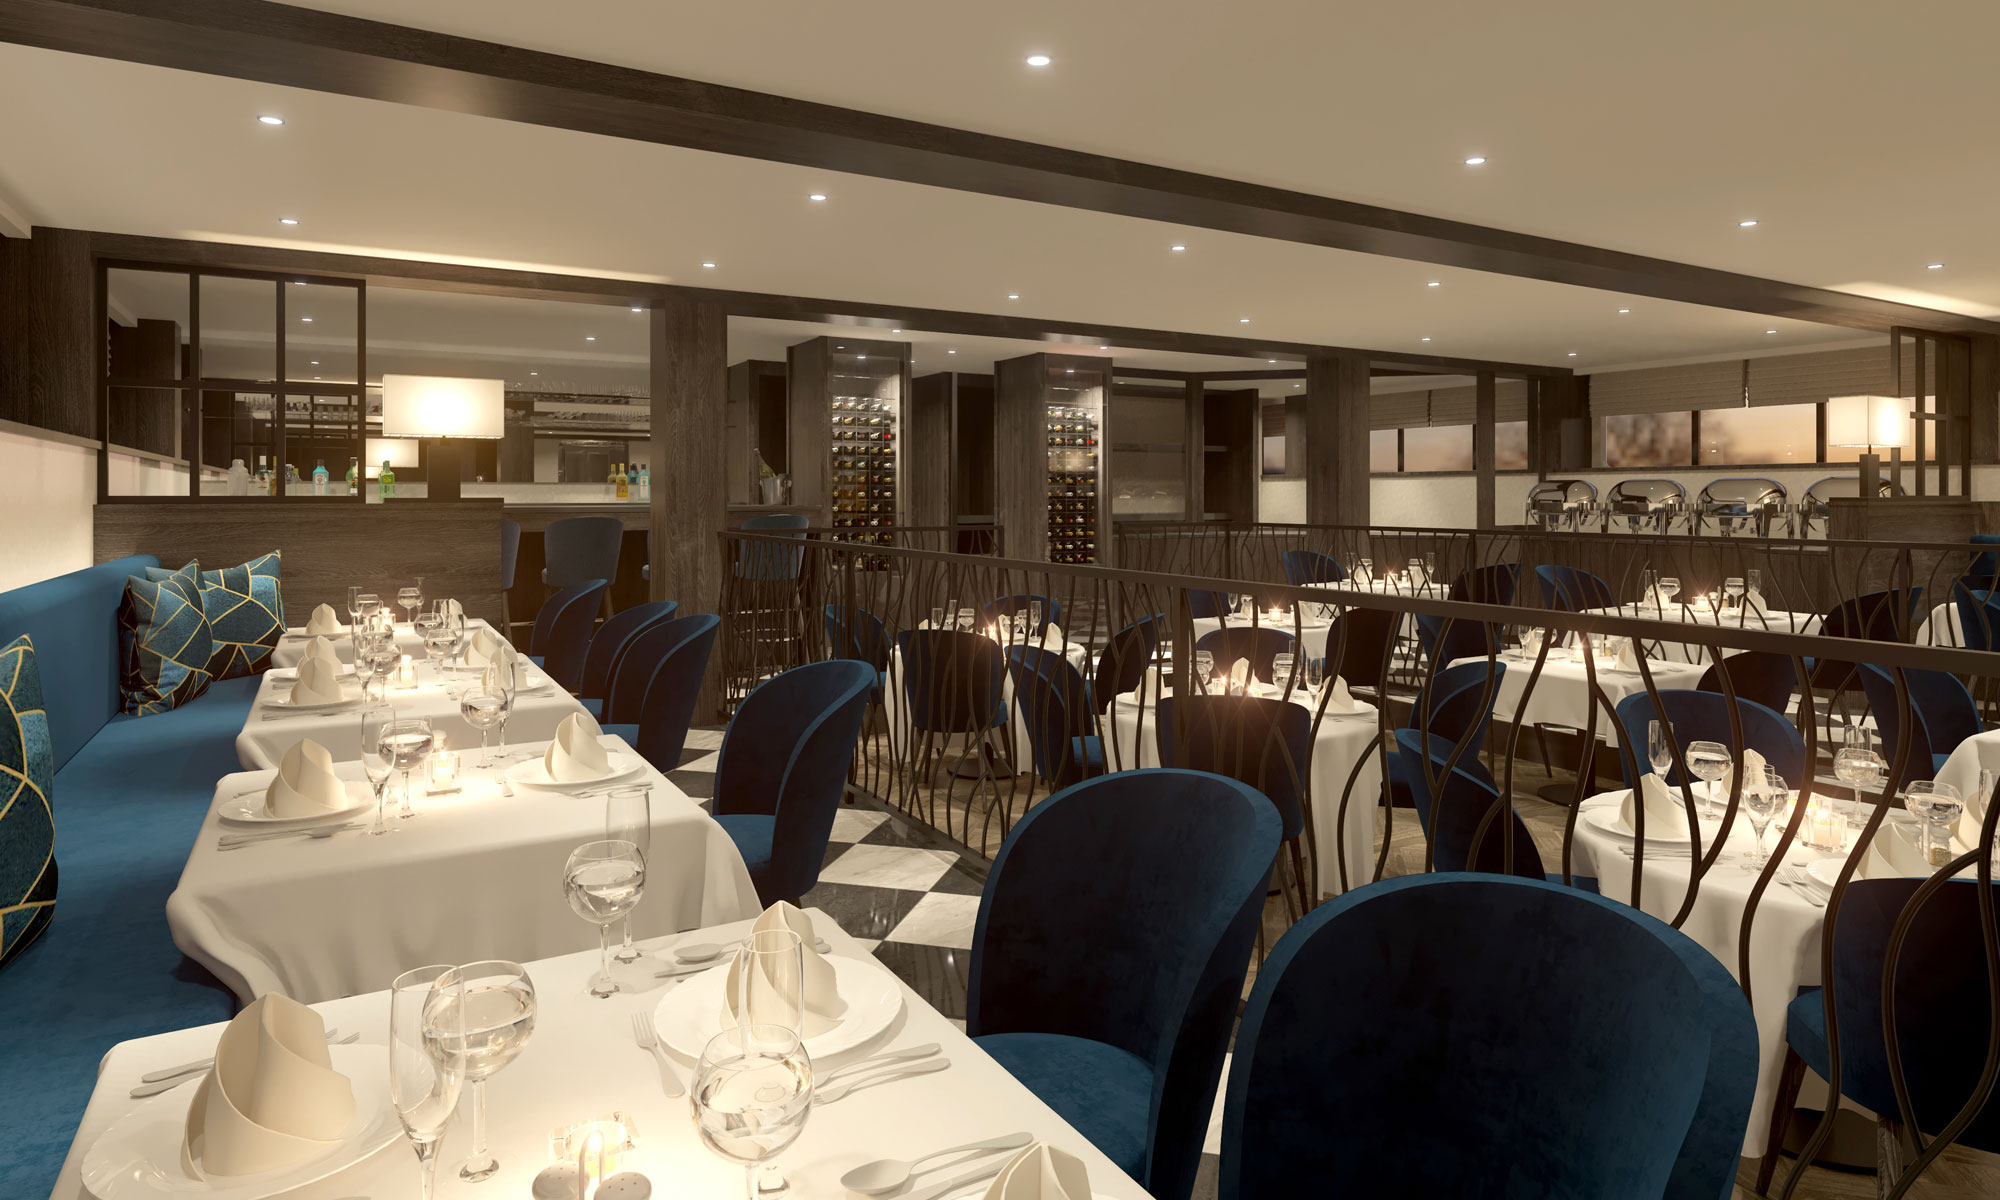 nickoVISION Spezialitäten-Restaurant. Foto: nicko cruises